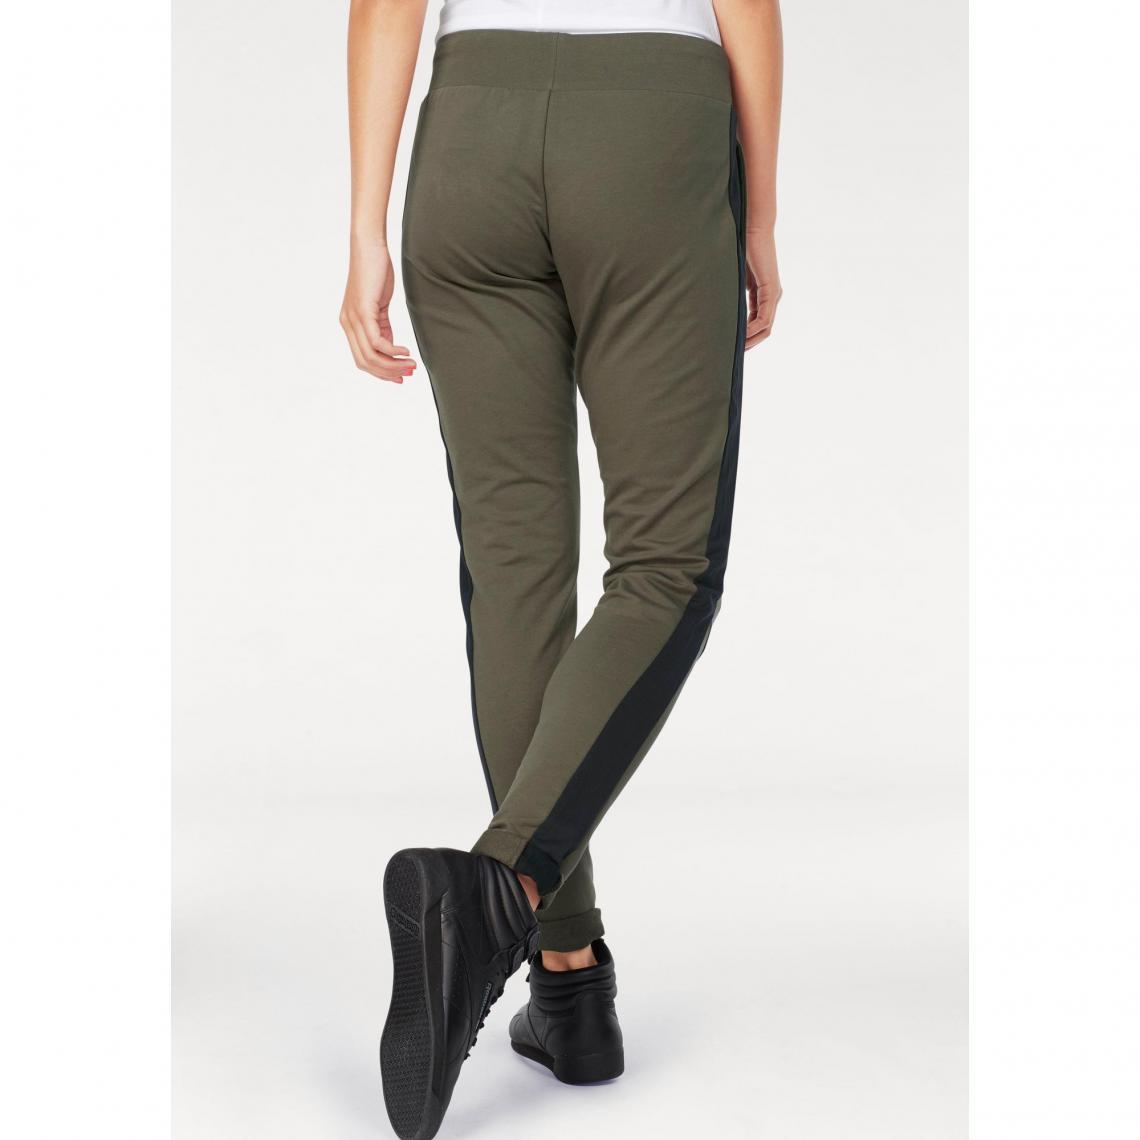 Pantalon de jogging femme Training Supply Slim Reebok - Noir  660036cac60